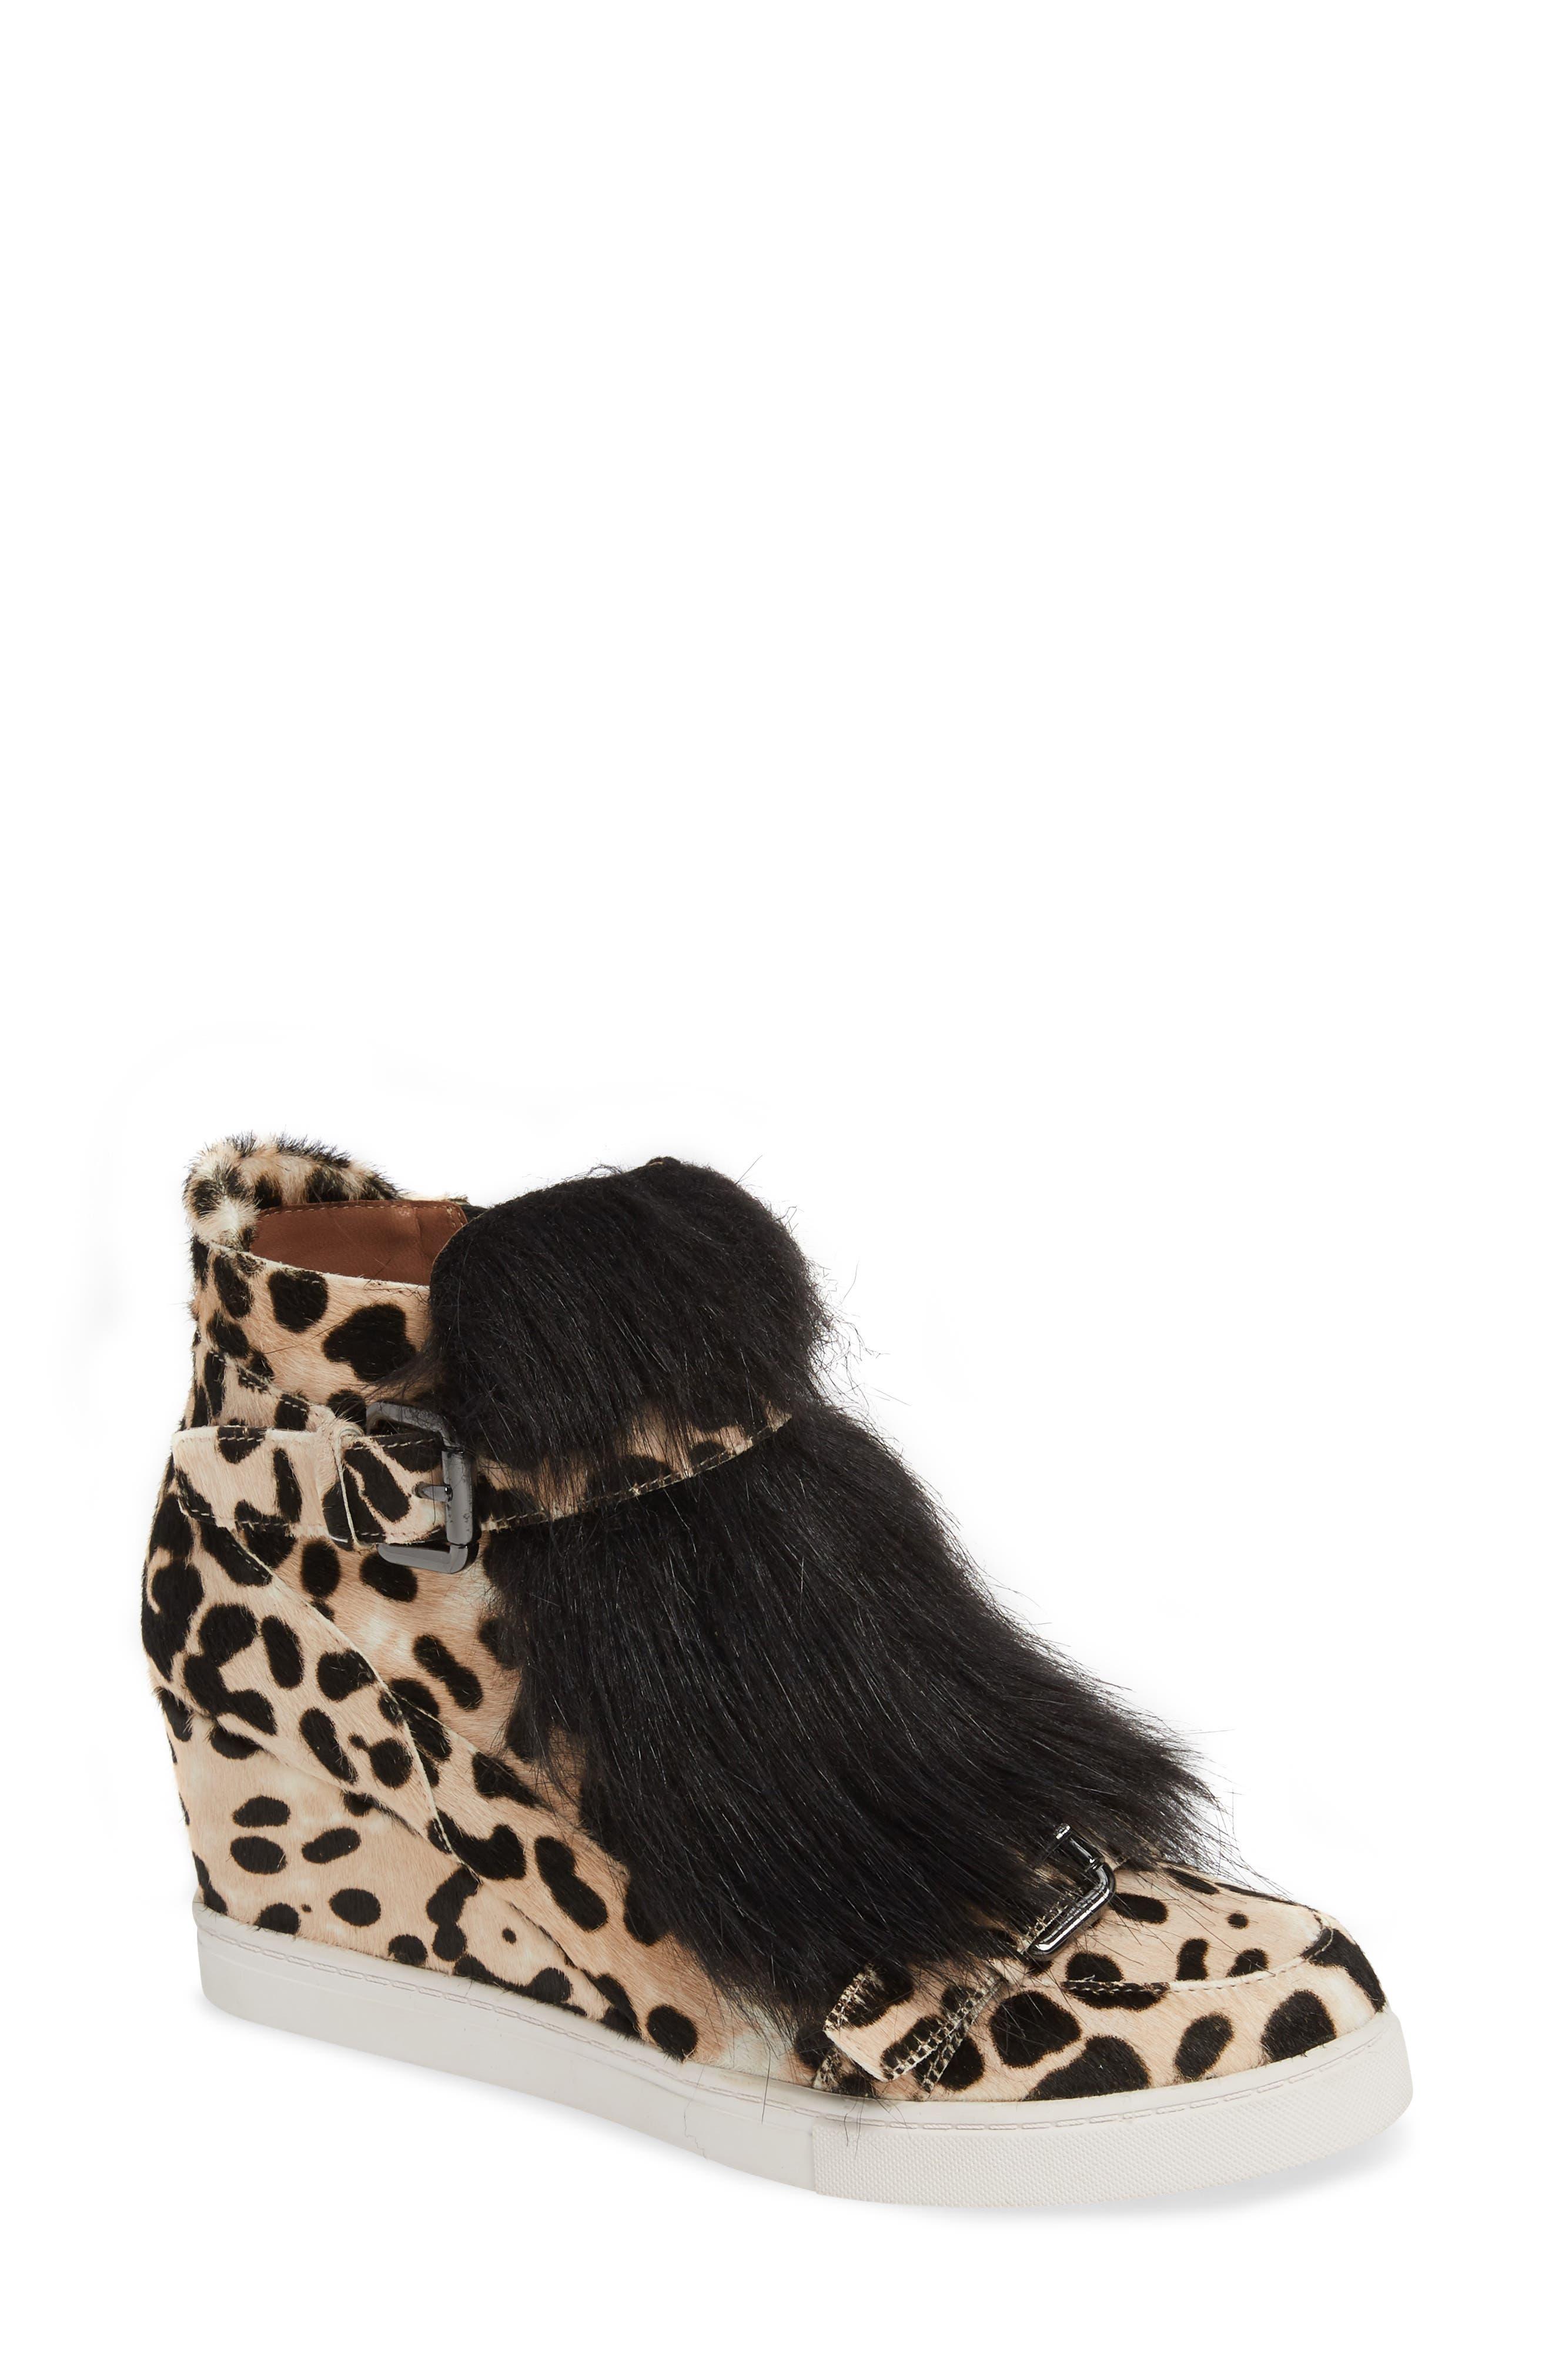 LINEA PAOLO Fifi 2 Wedge Sneaker, Main, color, WHITE/ BLACK LEOPARD HAIRCALF